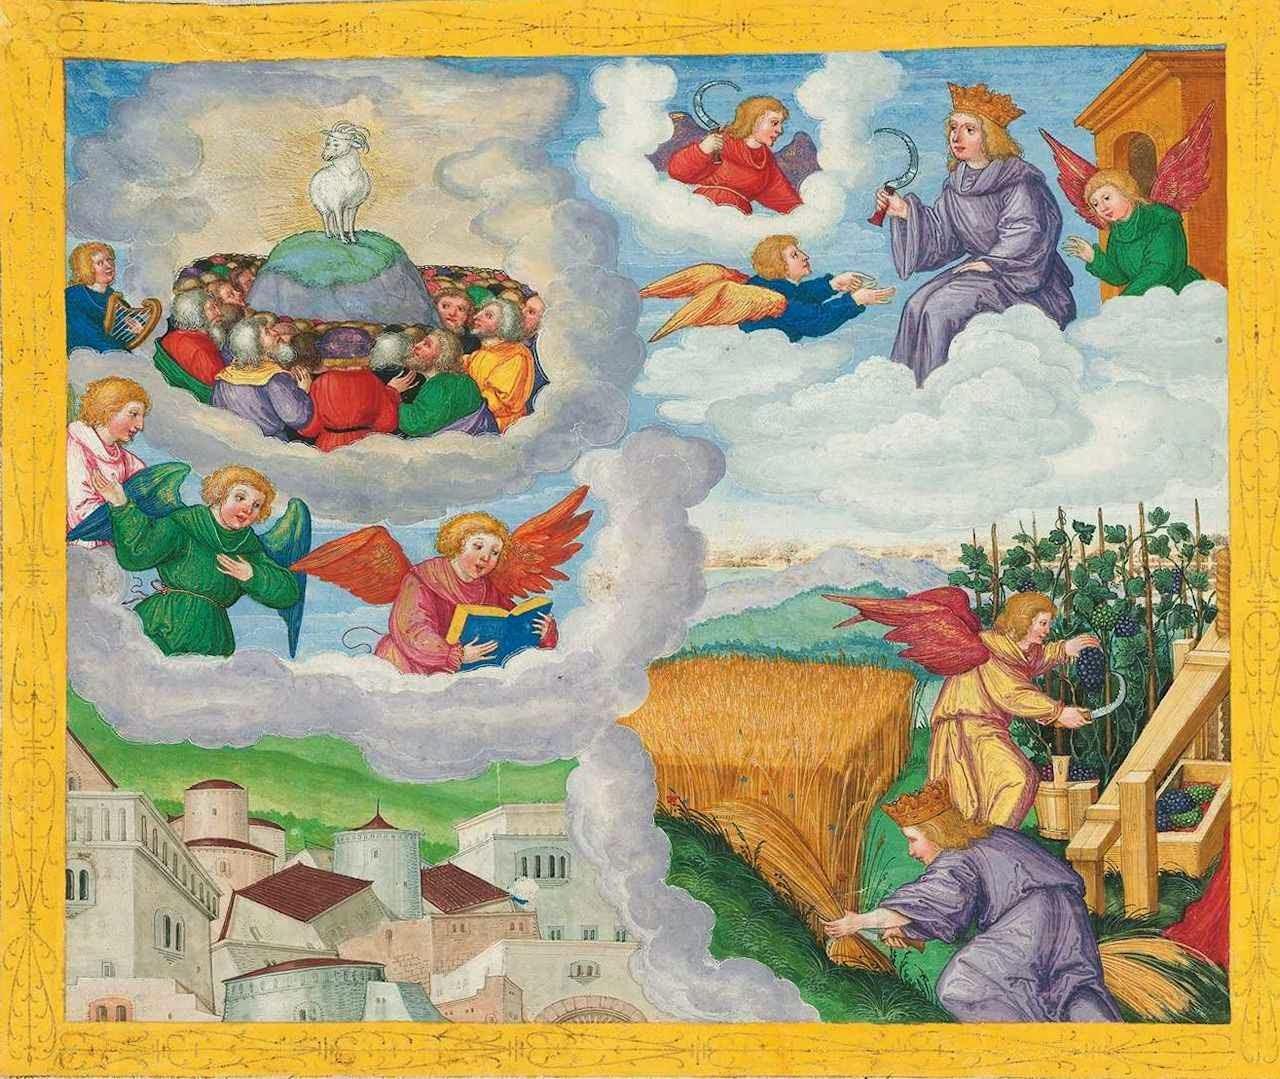 Anjo sai do Templo e manda segar e vendimiar. Ottheinrich-Bibel, Bayerische Staatsbibliothek, Cgm 8010.